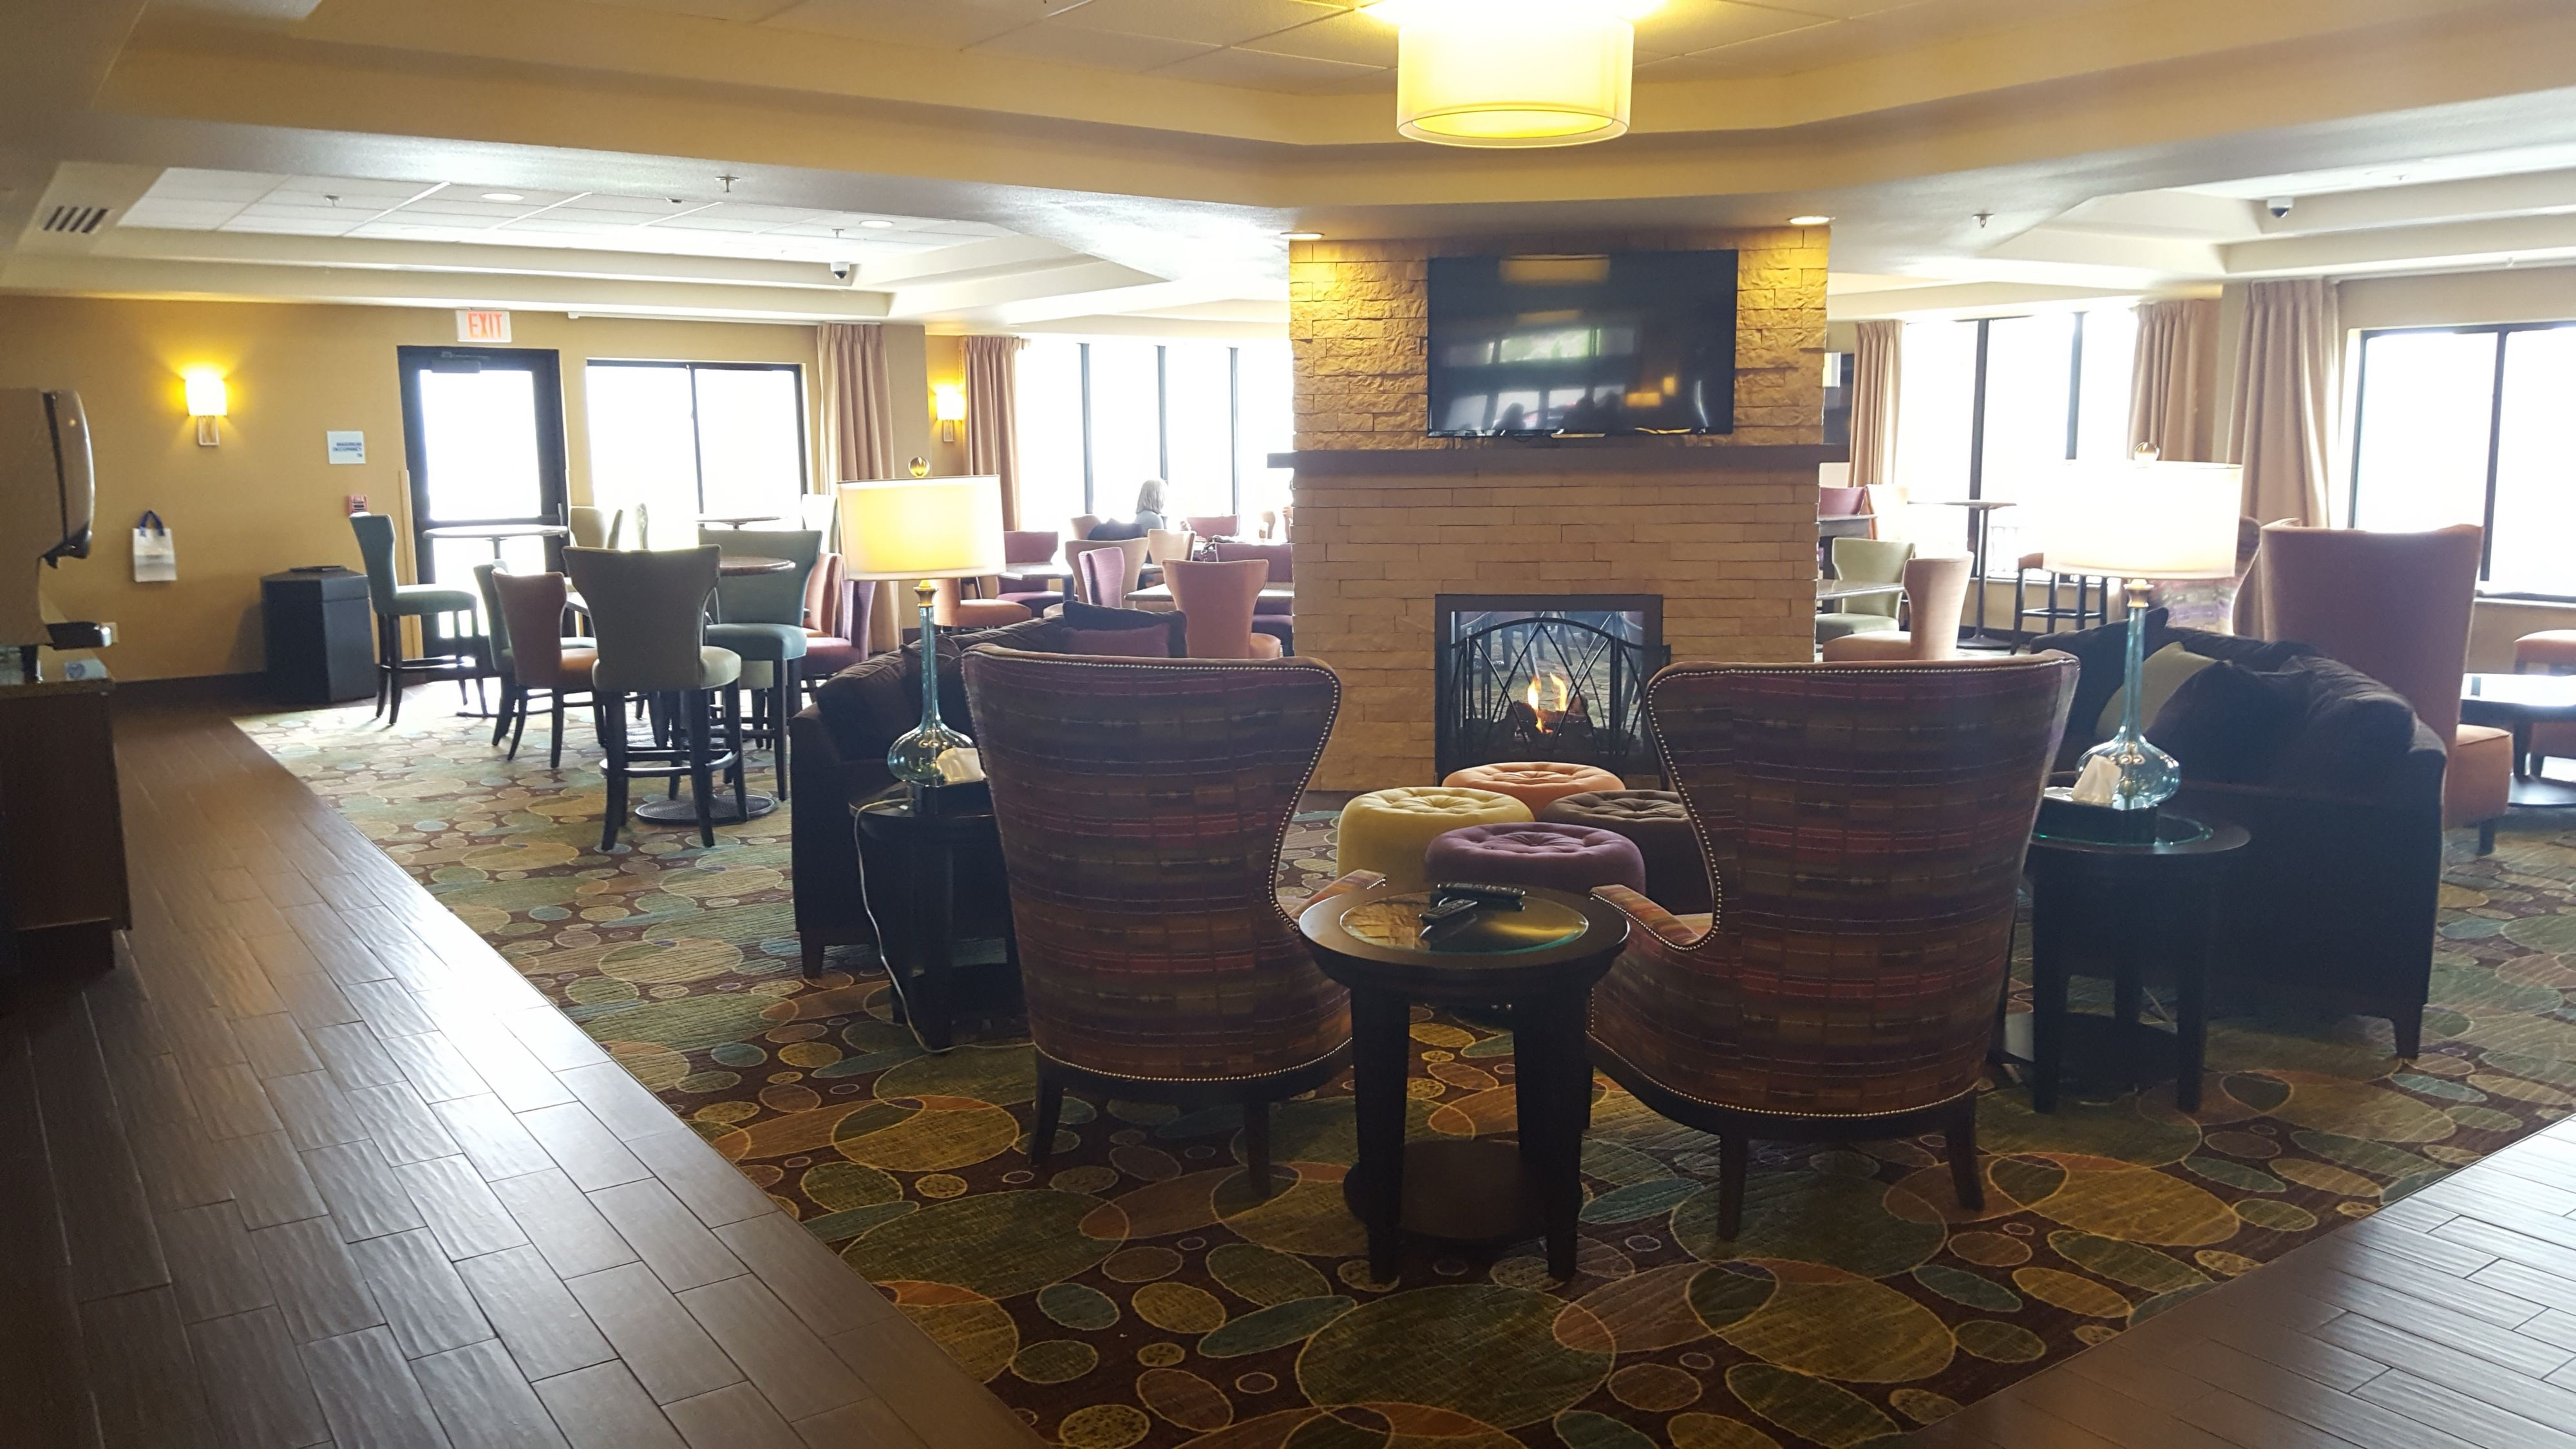 Holiday Inn Express & Suites Pocatello image 4